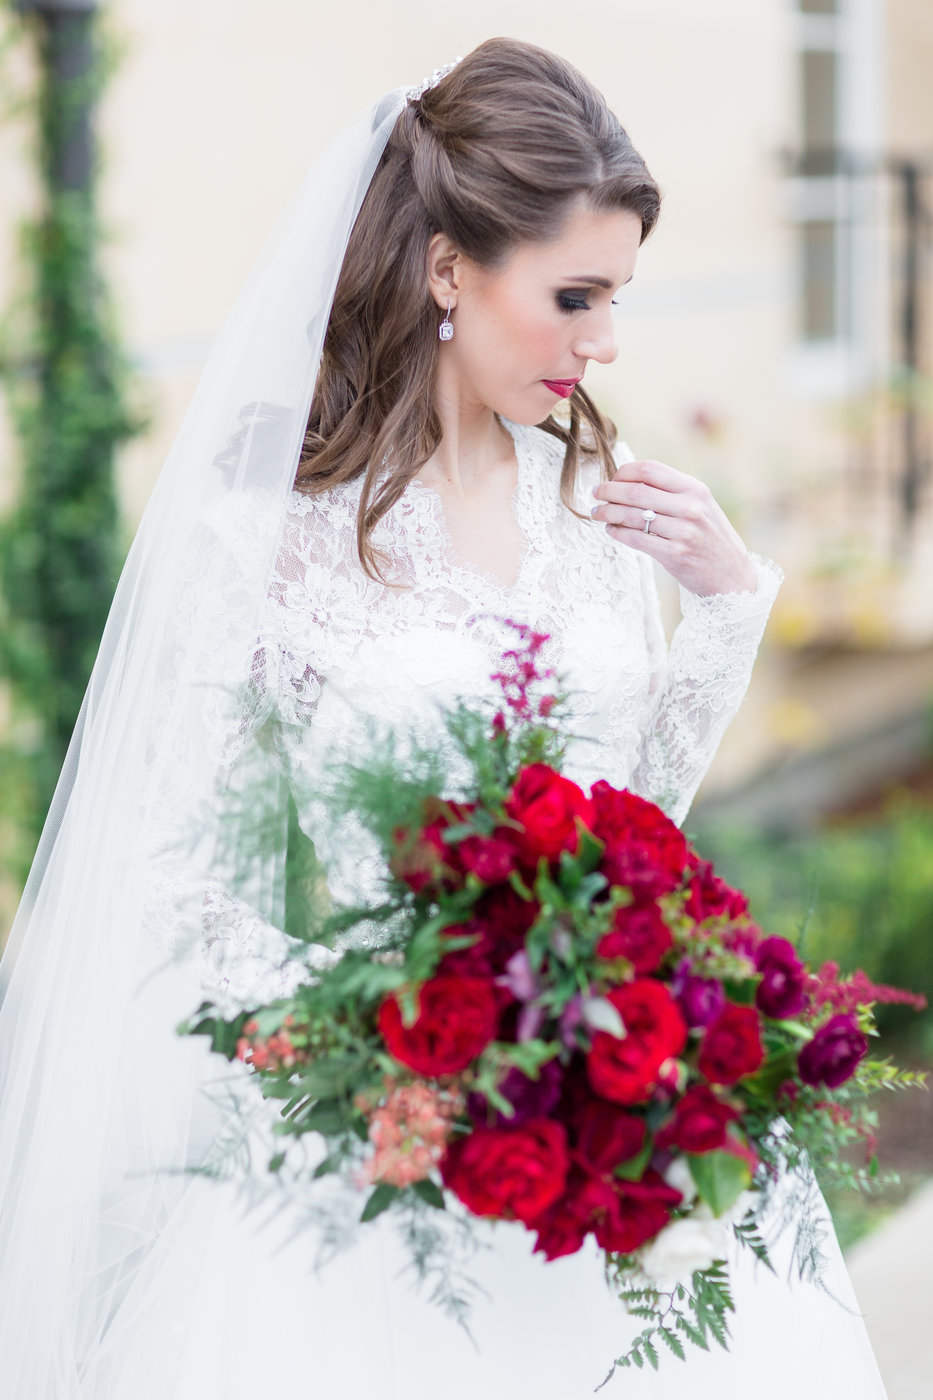 destination-Palo-Alto-wedding-photographersjpg